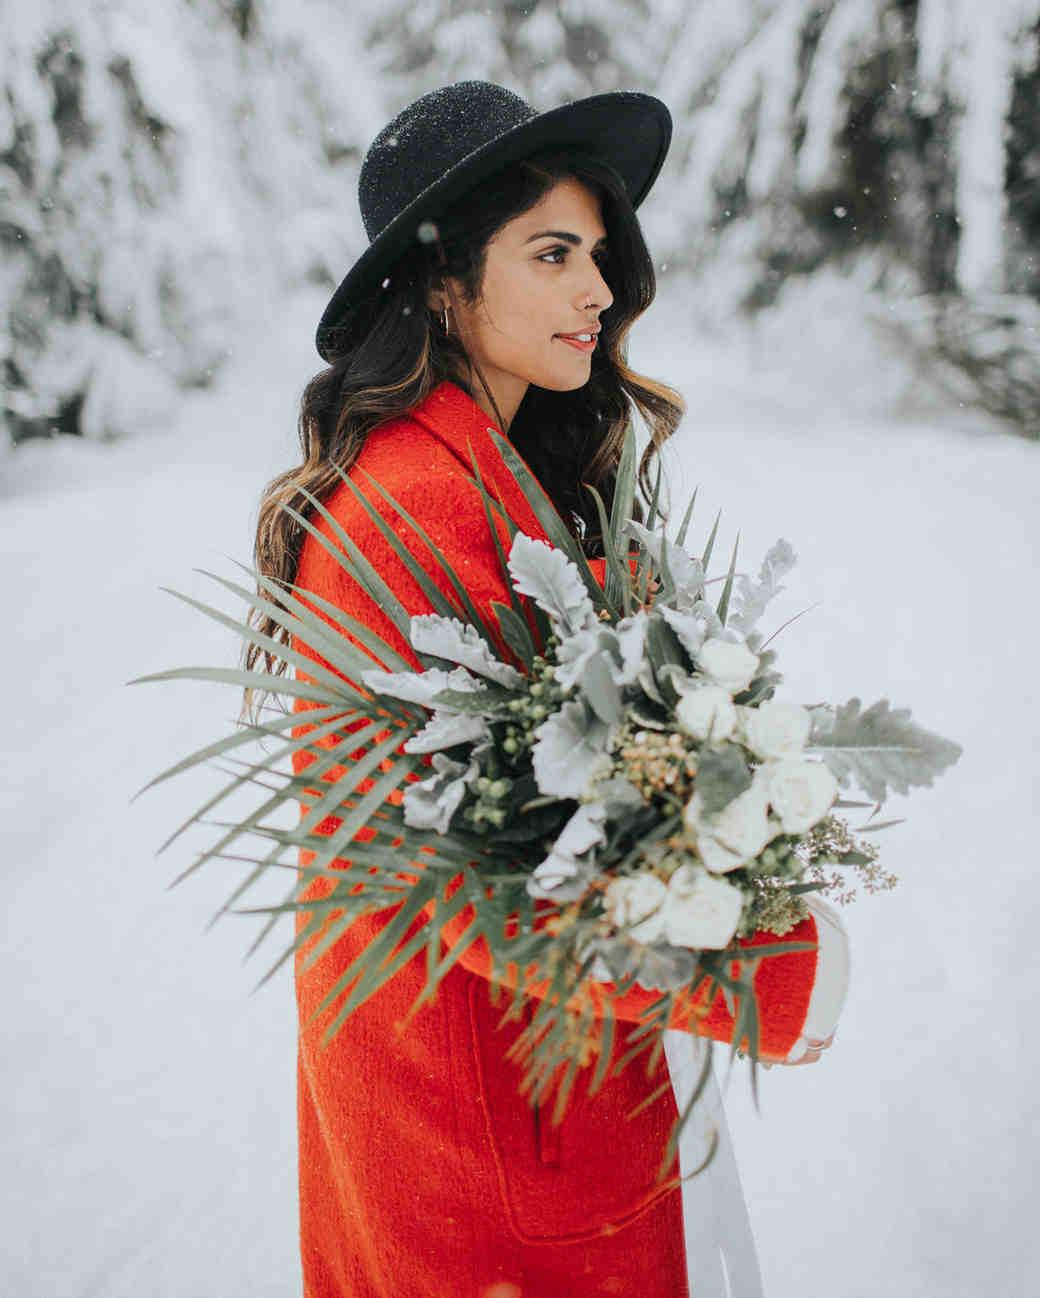 winter wedding guest attire woman in blood orange coat